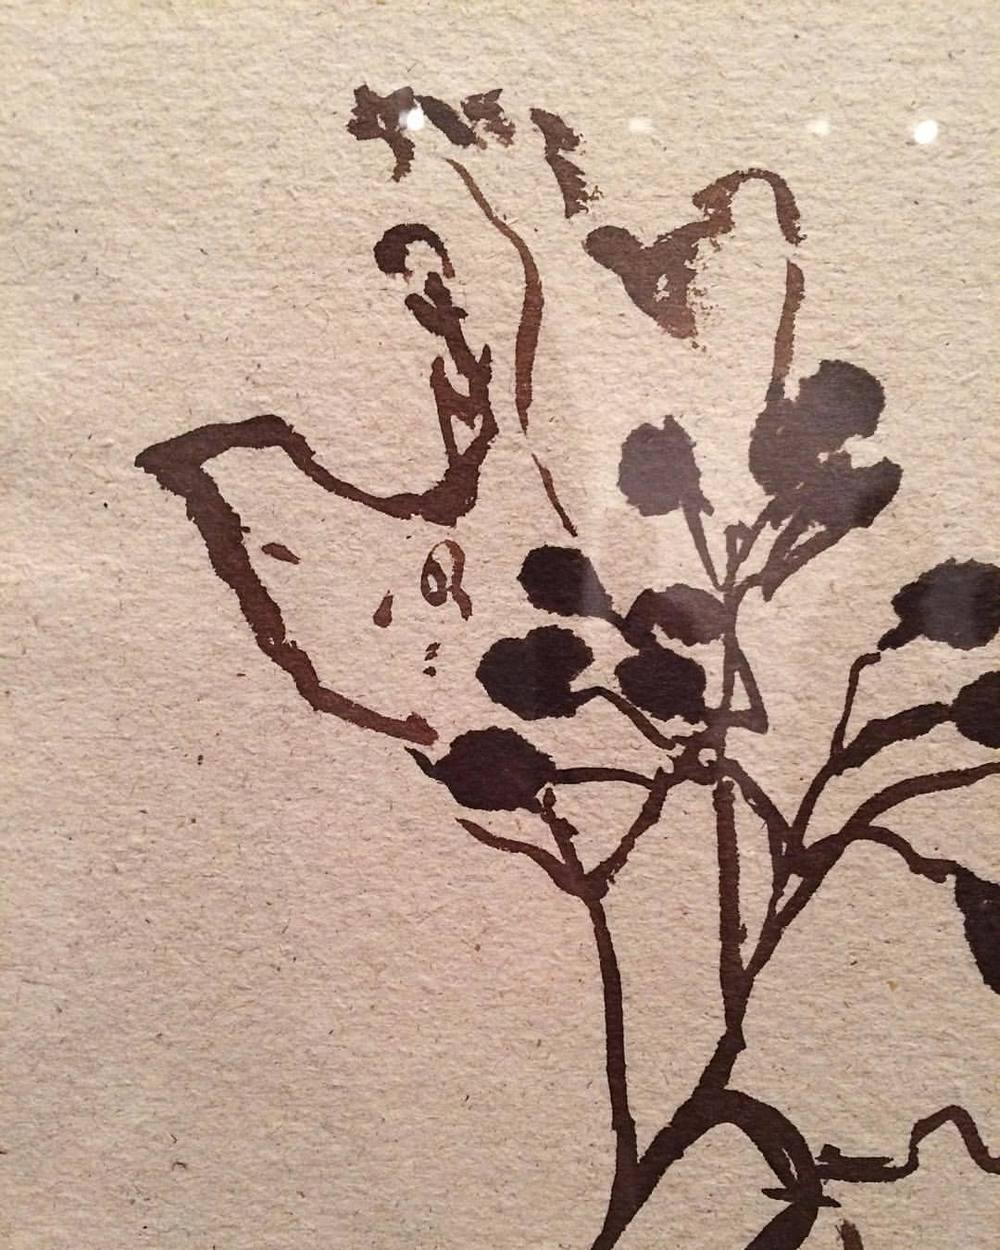 Details #lucyauge #500flowers